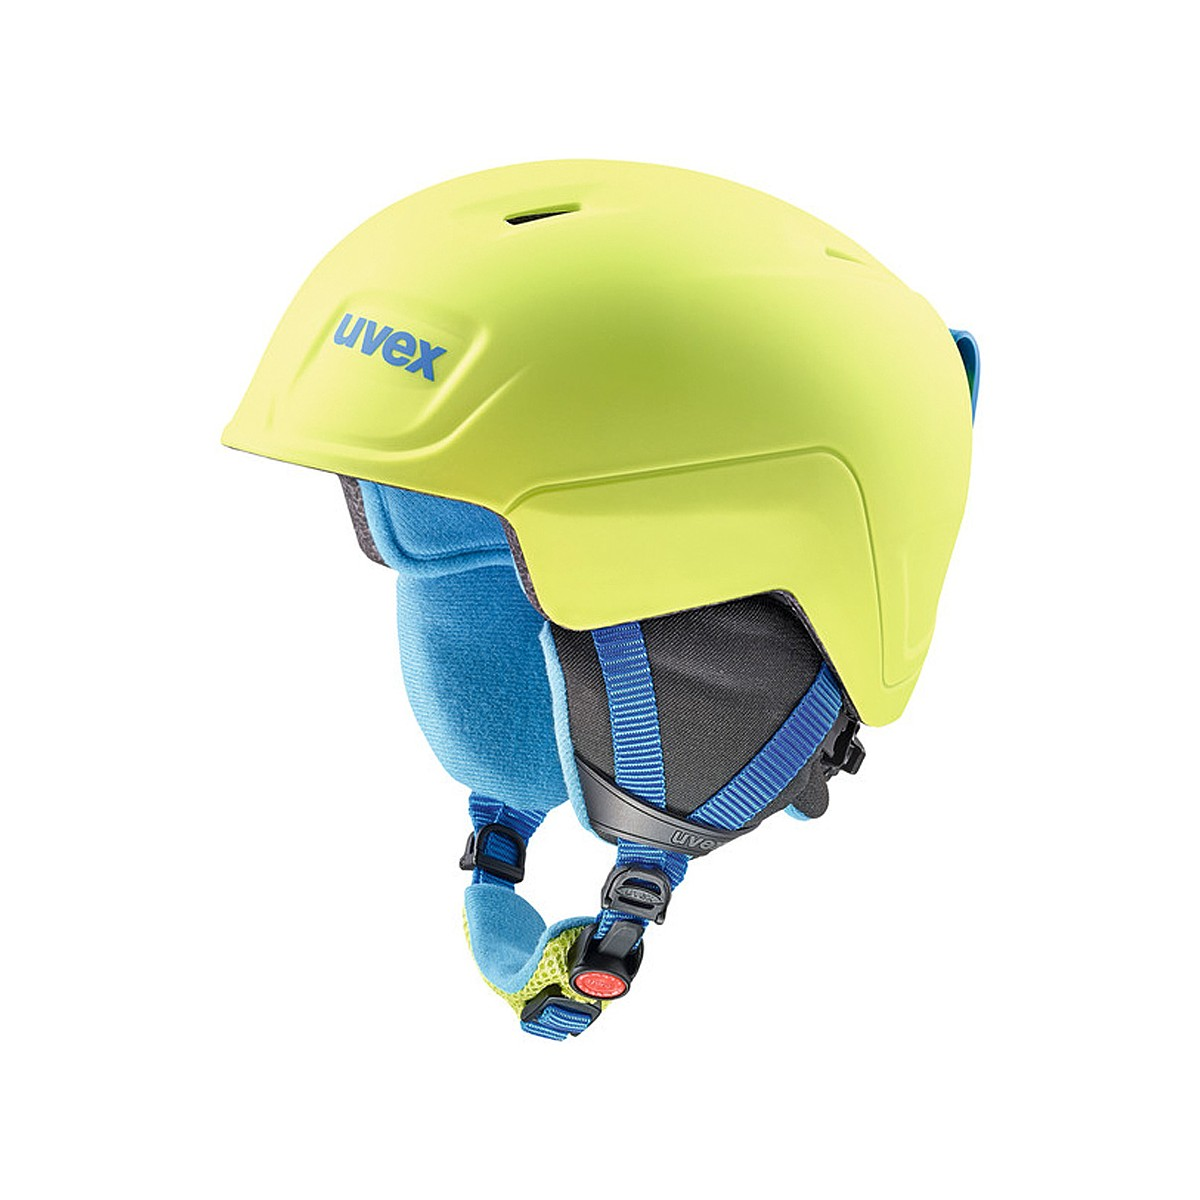 Casco sci Uvex Manic Pro (Colore: blue-lime met mat, Taglia: 54/58)